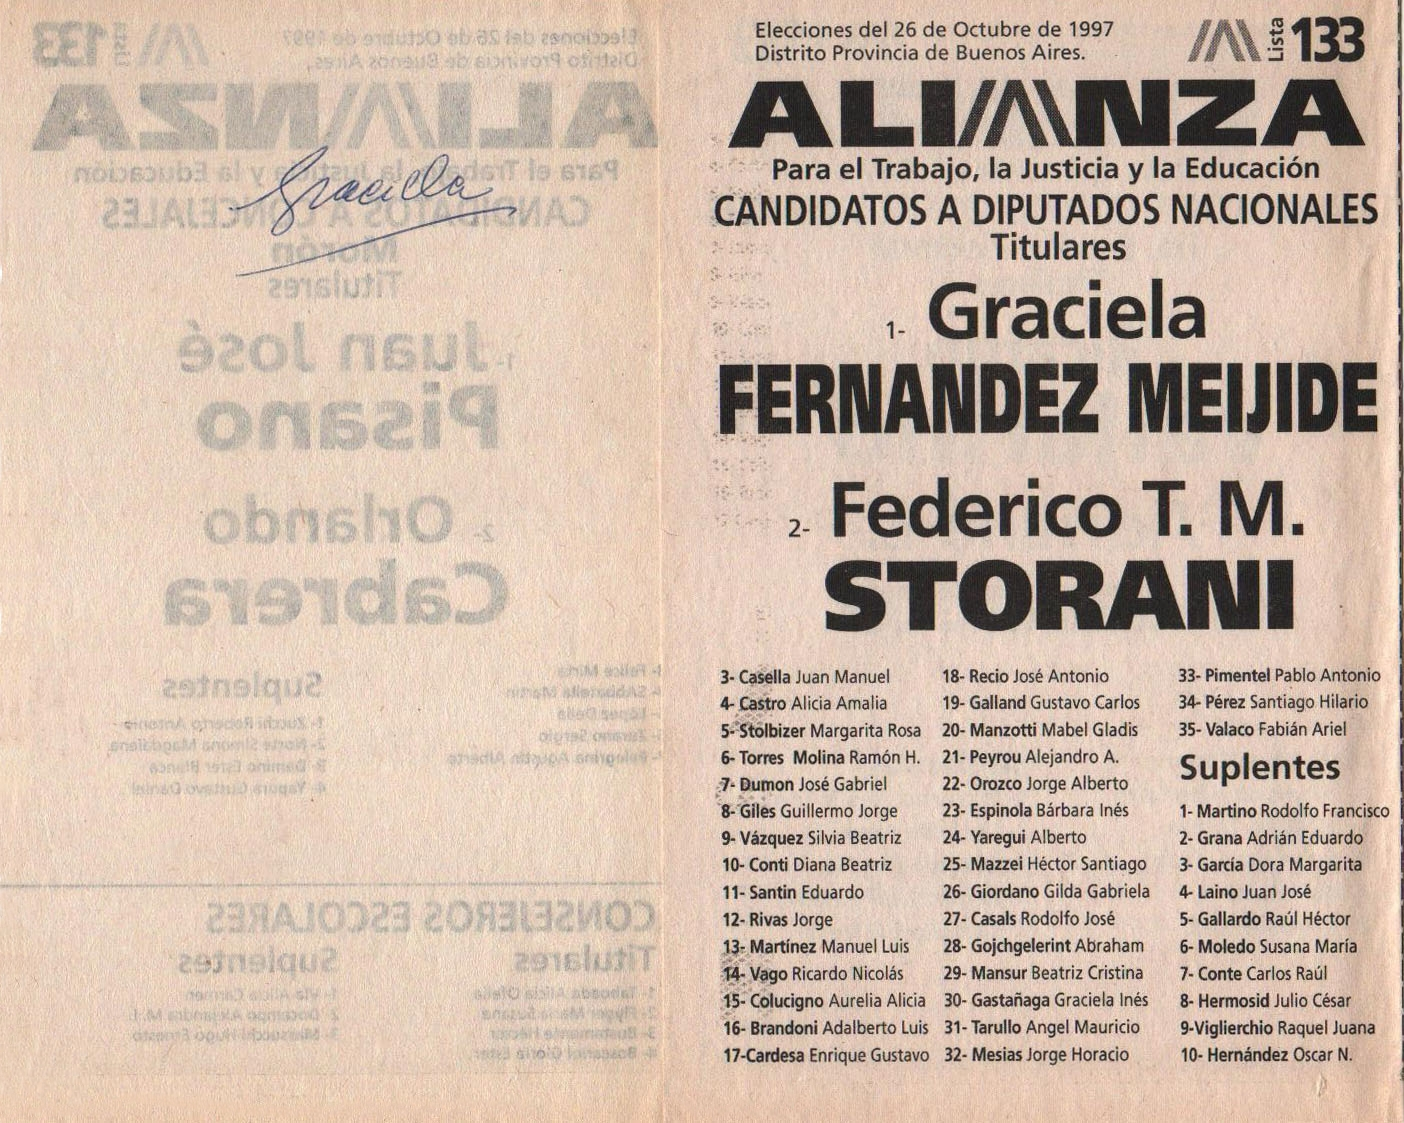 21 de octubre de 1997: